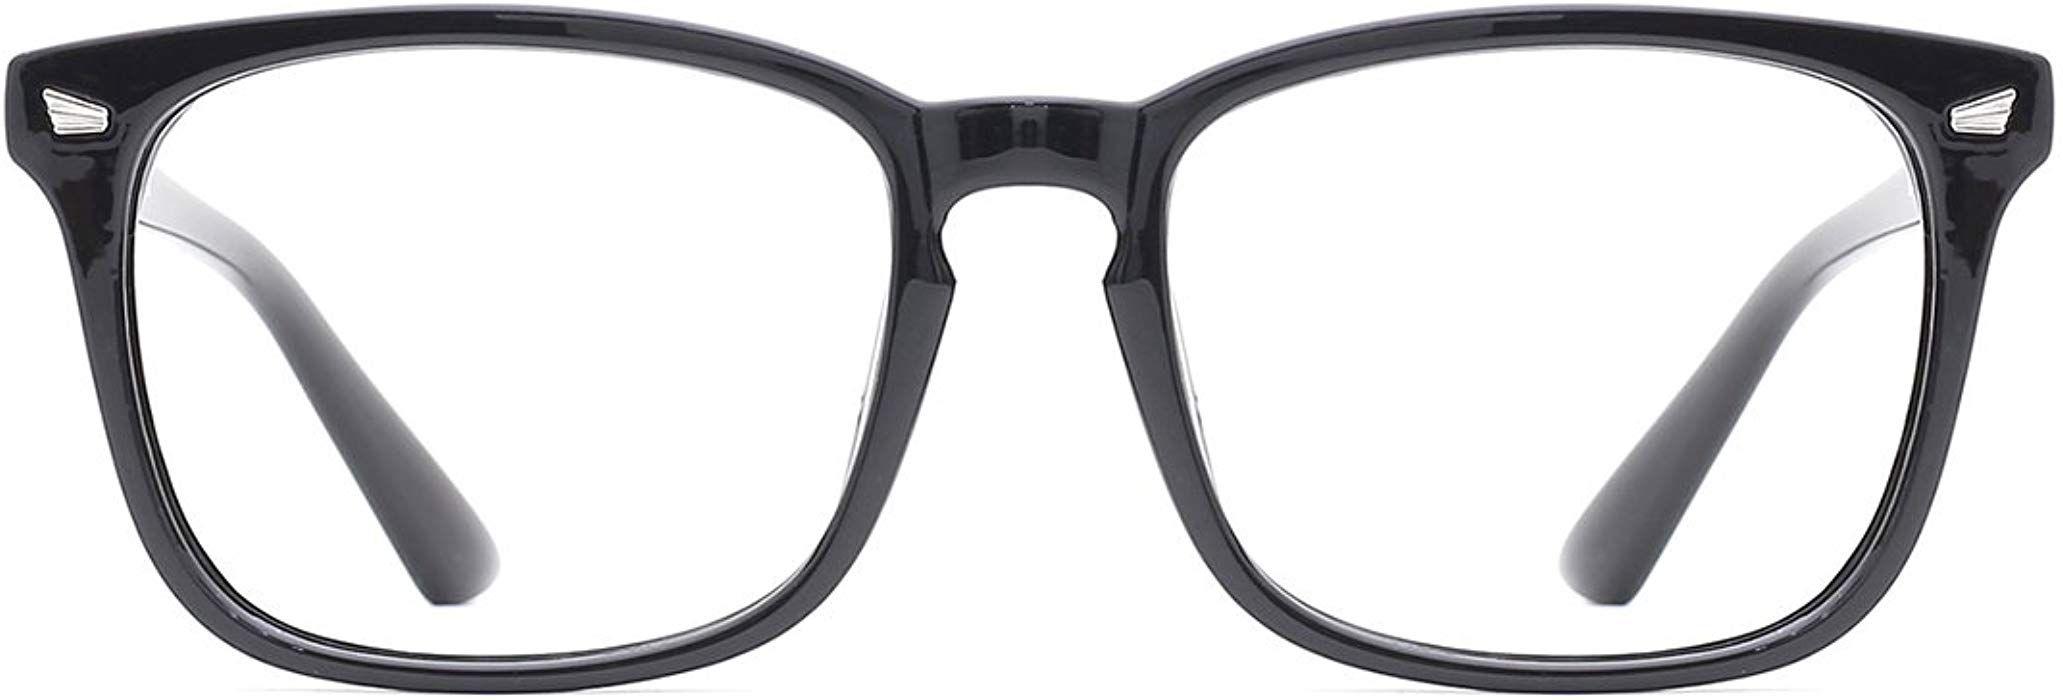 58a80f31918 Amazon.com  TIJN Blue Light Blocking Glasses Square Nerd Eyeglasses Frame  Anti Blue Ray Computer Game Glasses  Clothing